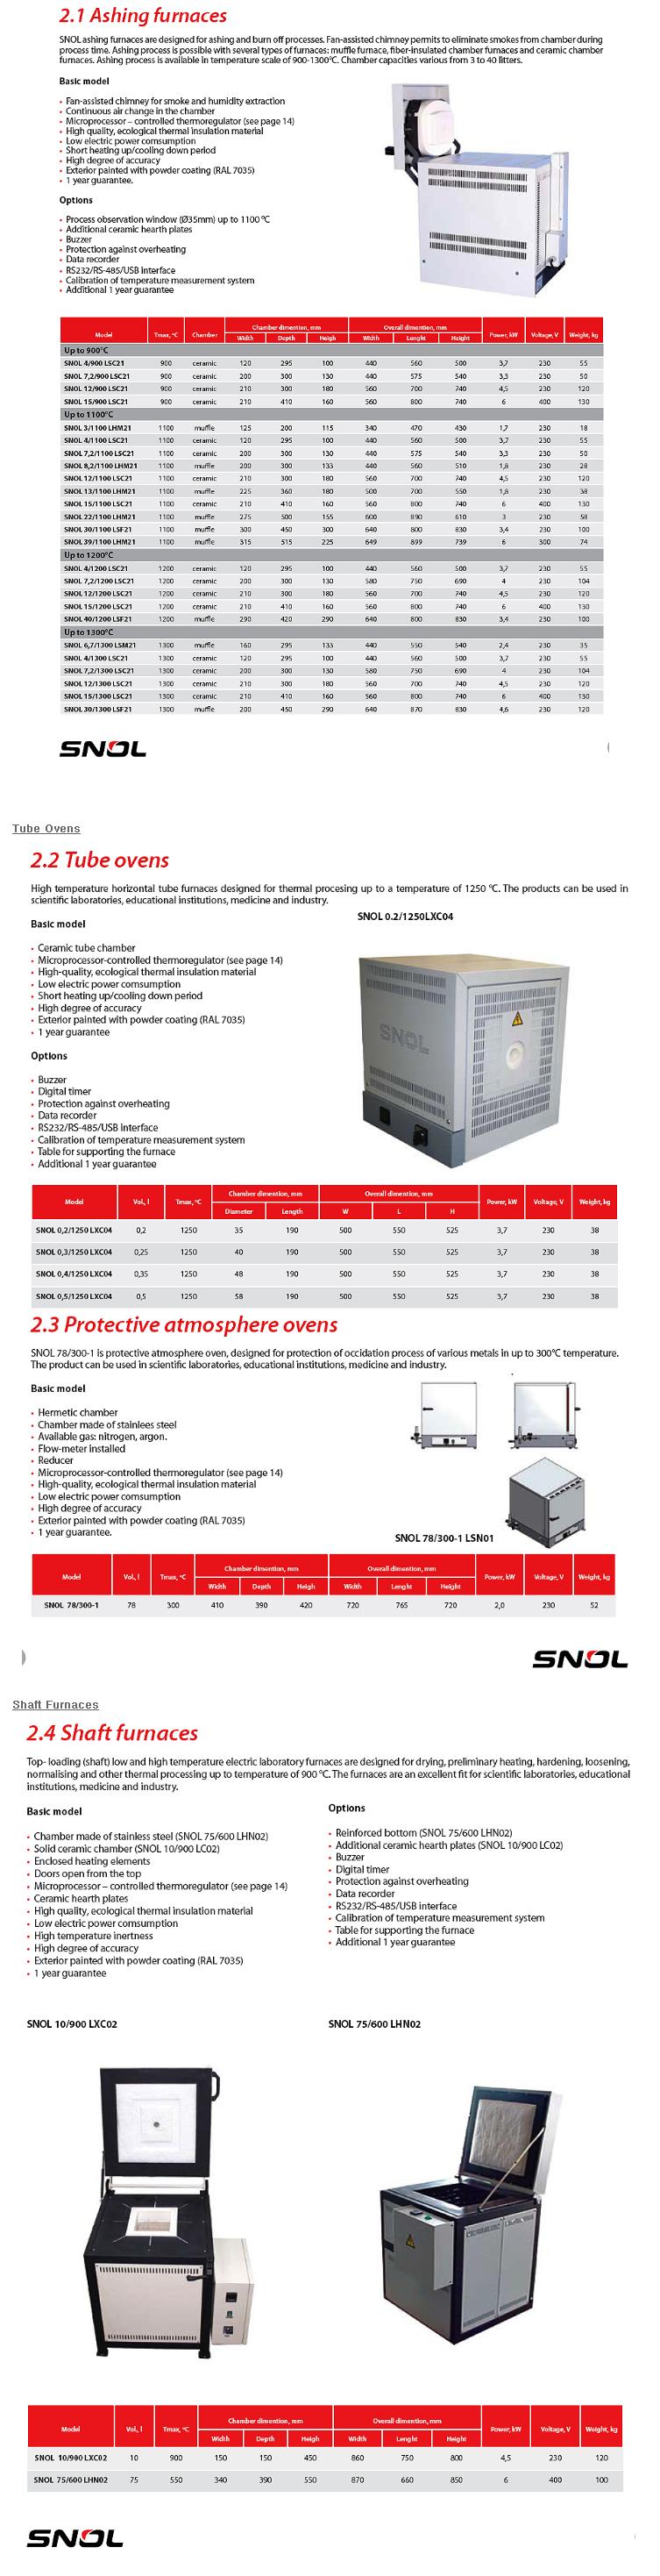 Ssaul Bestech Electric Lab Furnace  3